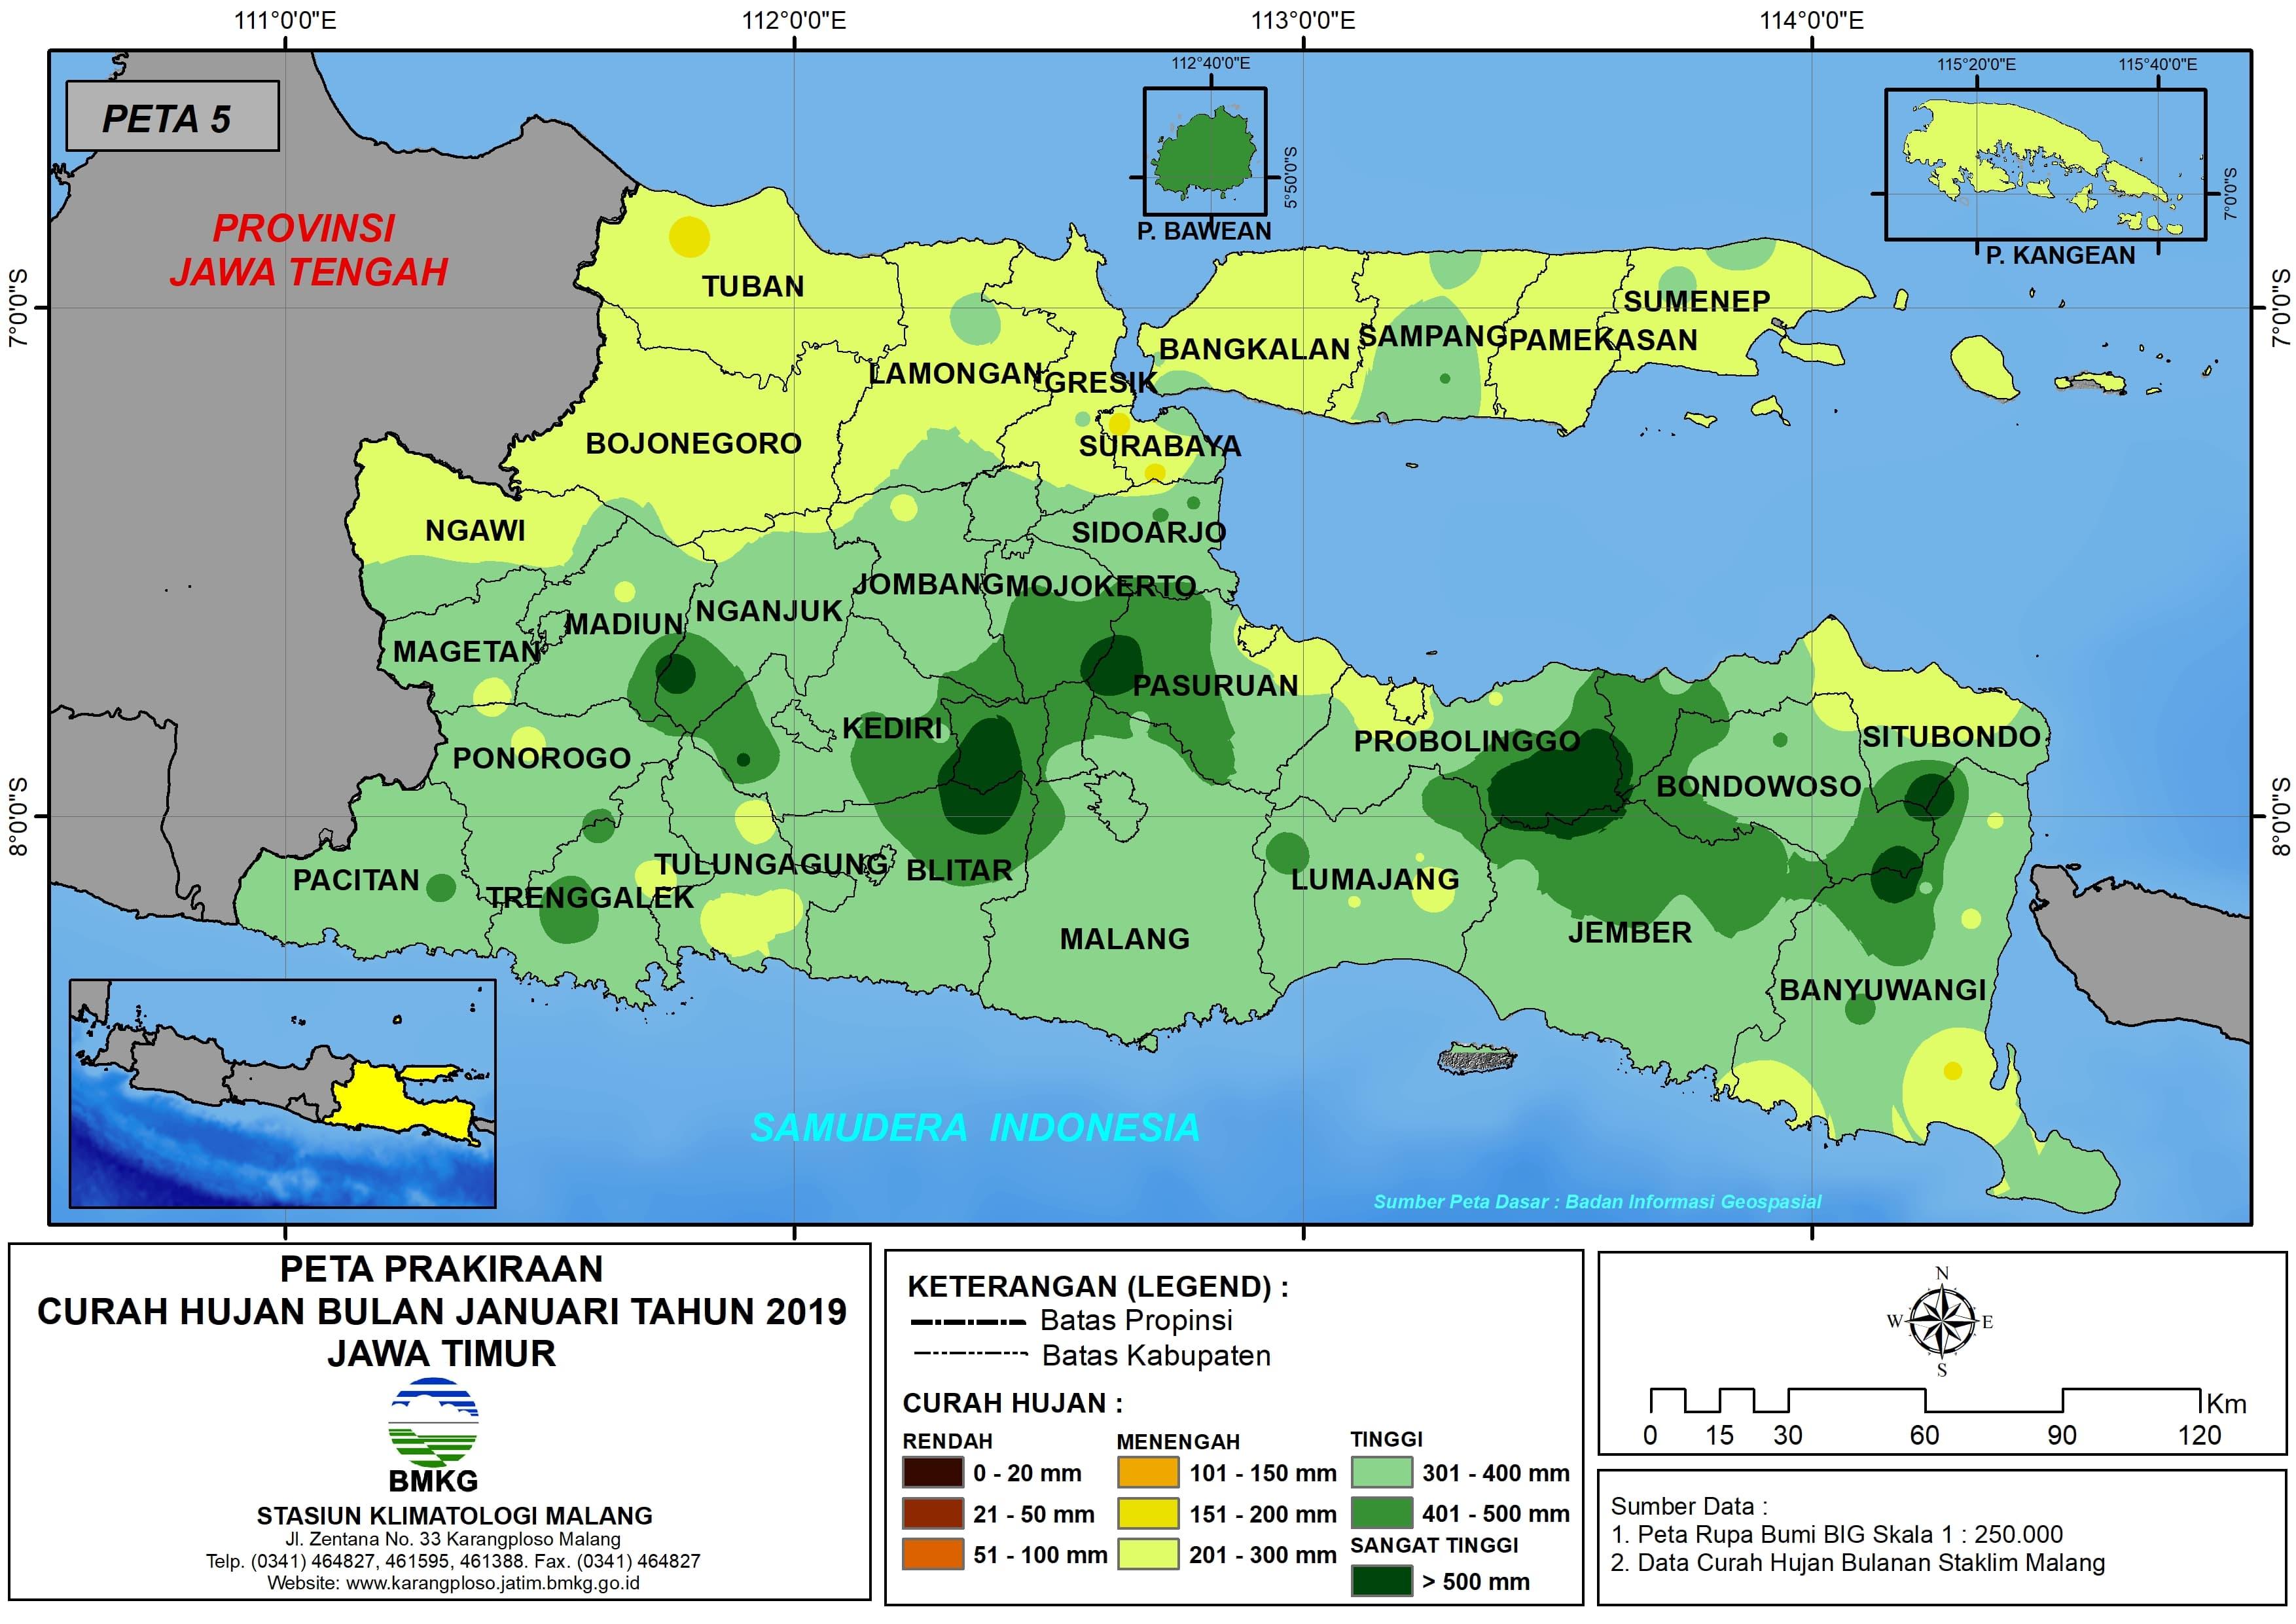 Prakiraan Curah Hujan Bulan Januari Tahun 2018 di Provinsi Jawa Timur Update dari Analisis Bulan November 2018